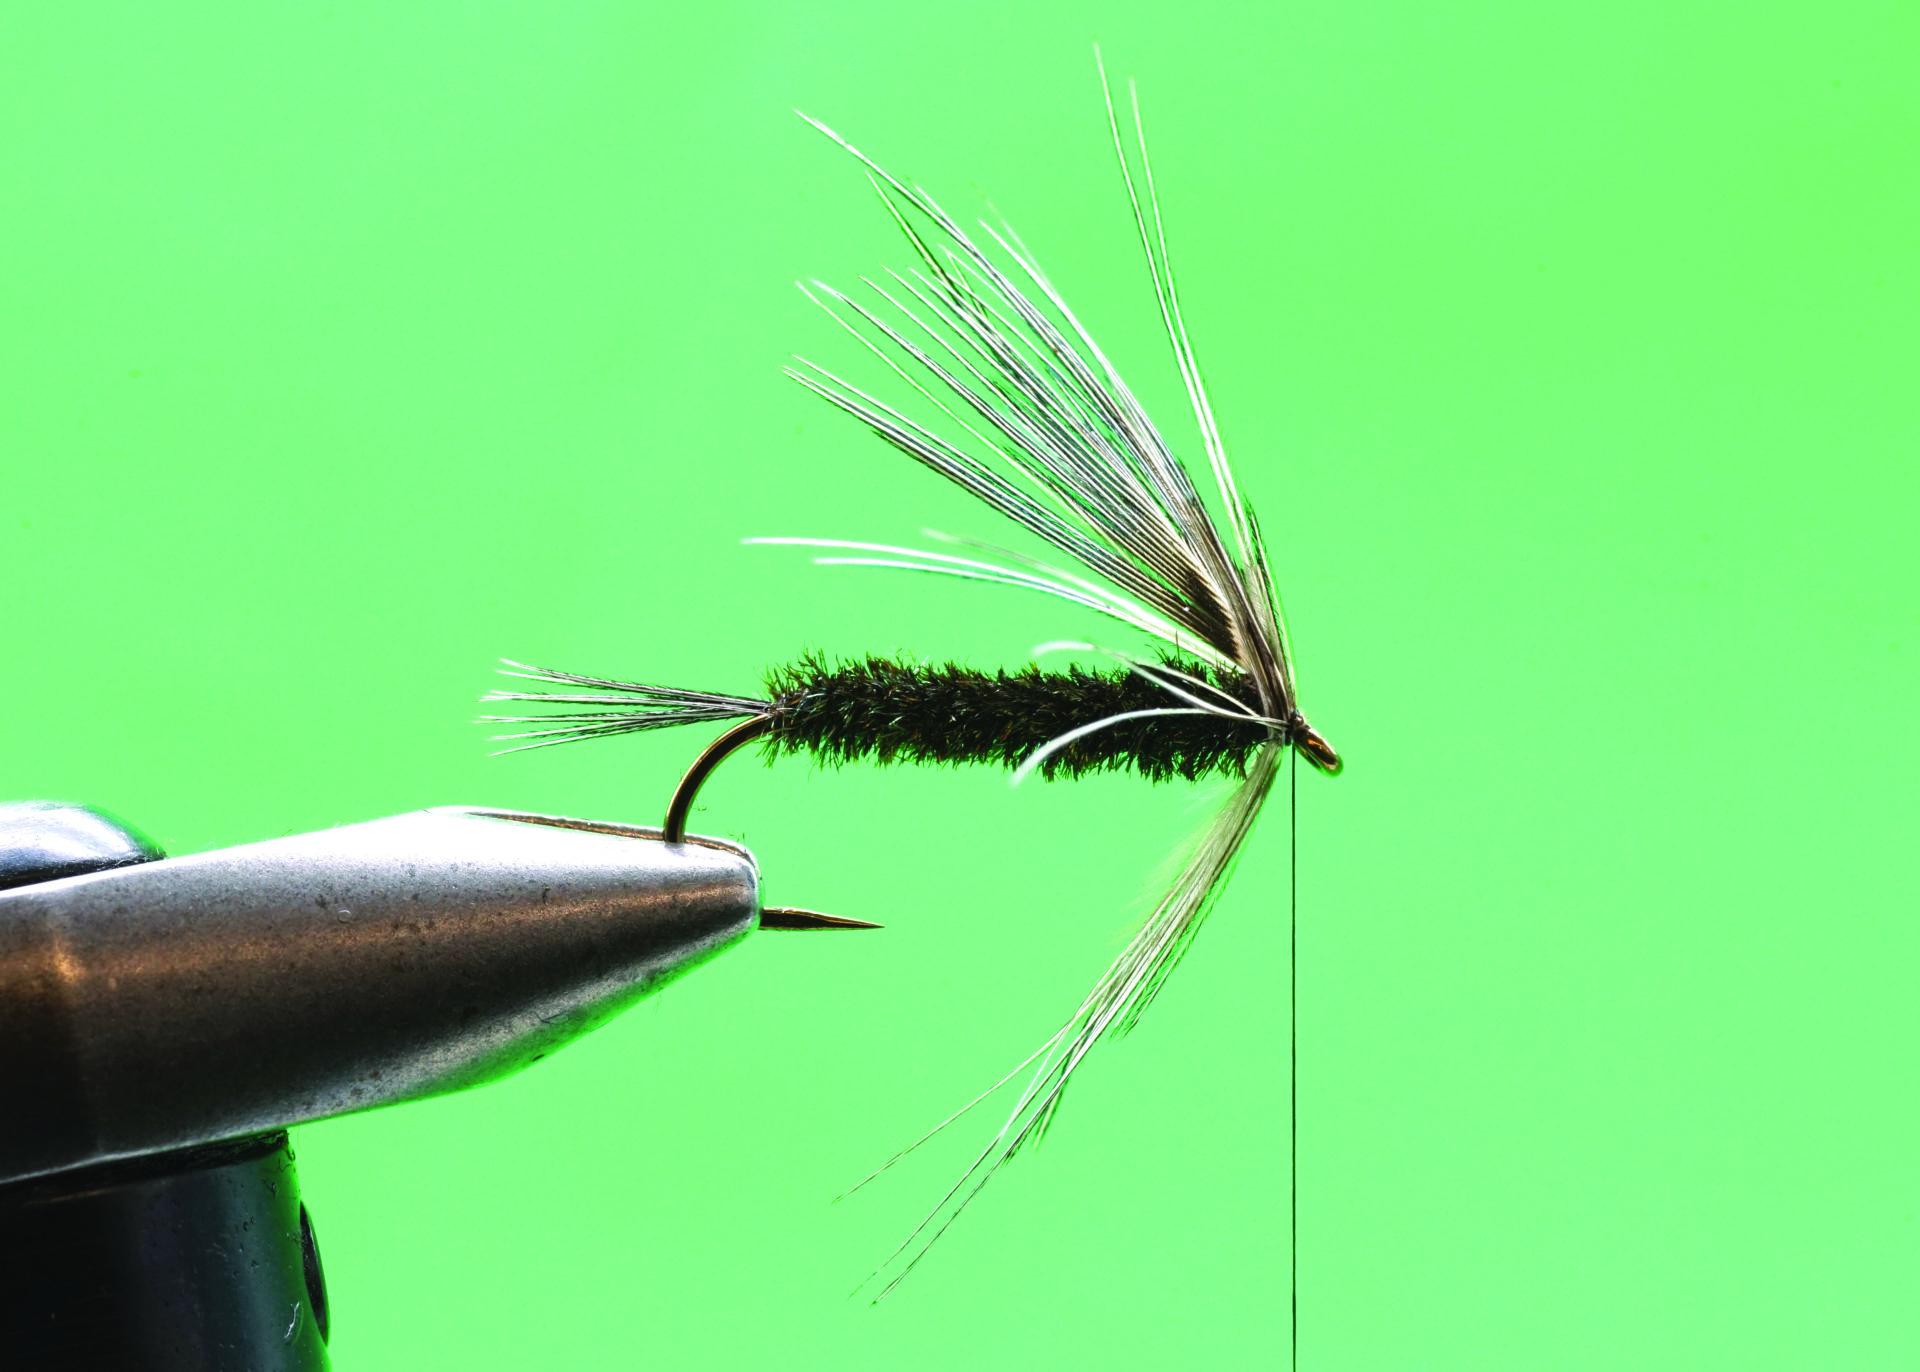 Peacock Carey: Step 6.